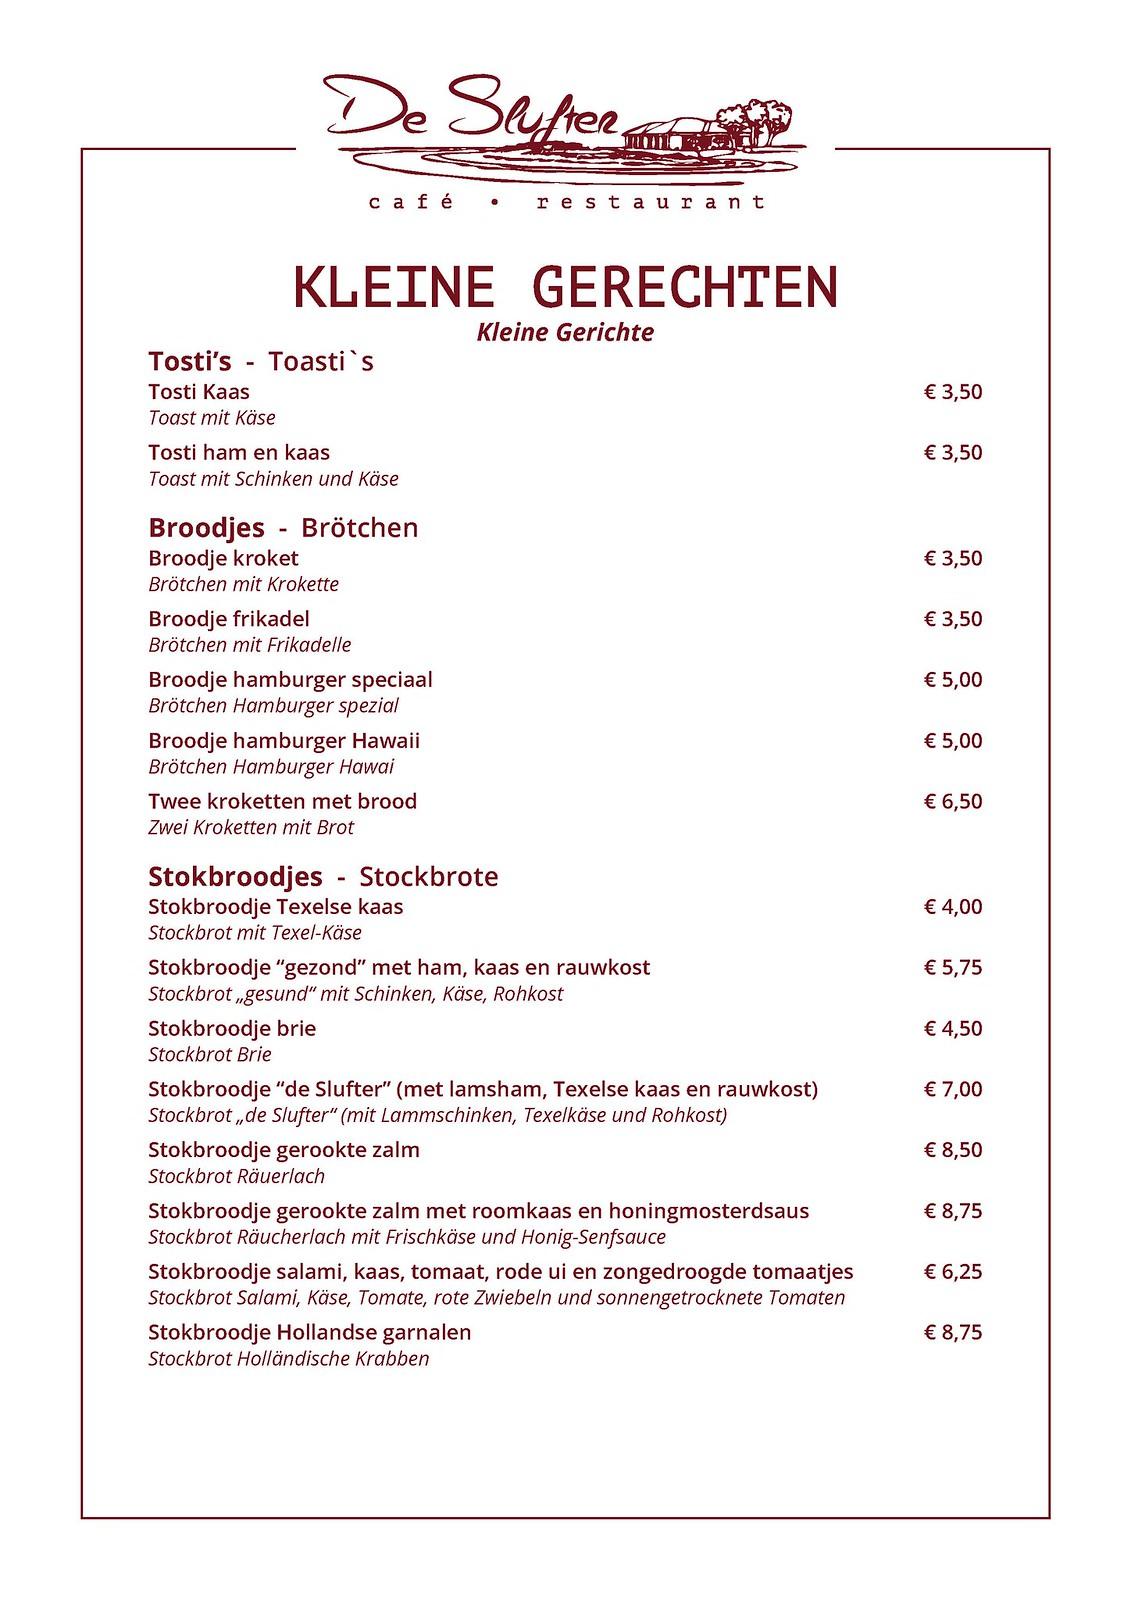 Menukaart Cafe Restaurant De Slufter